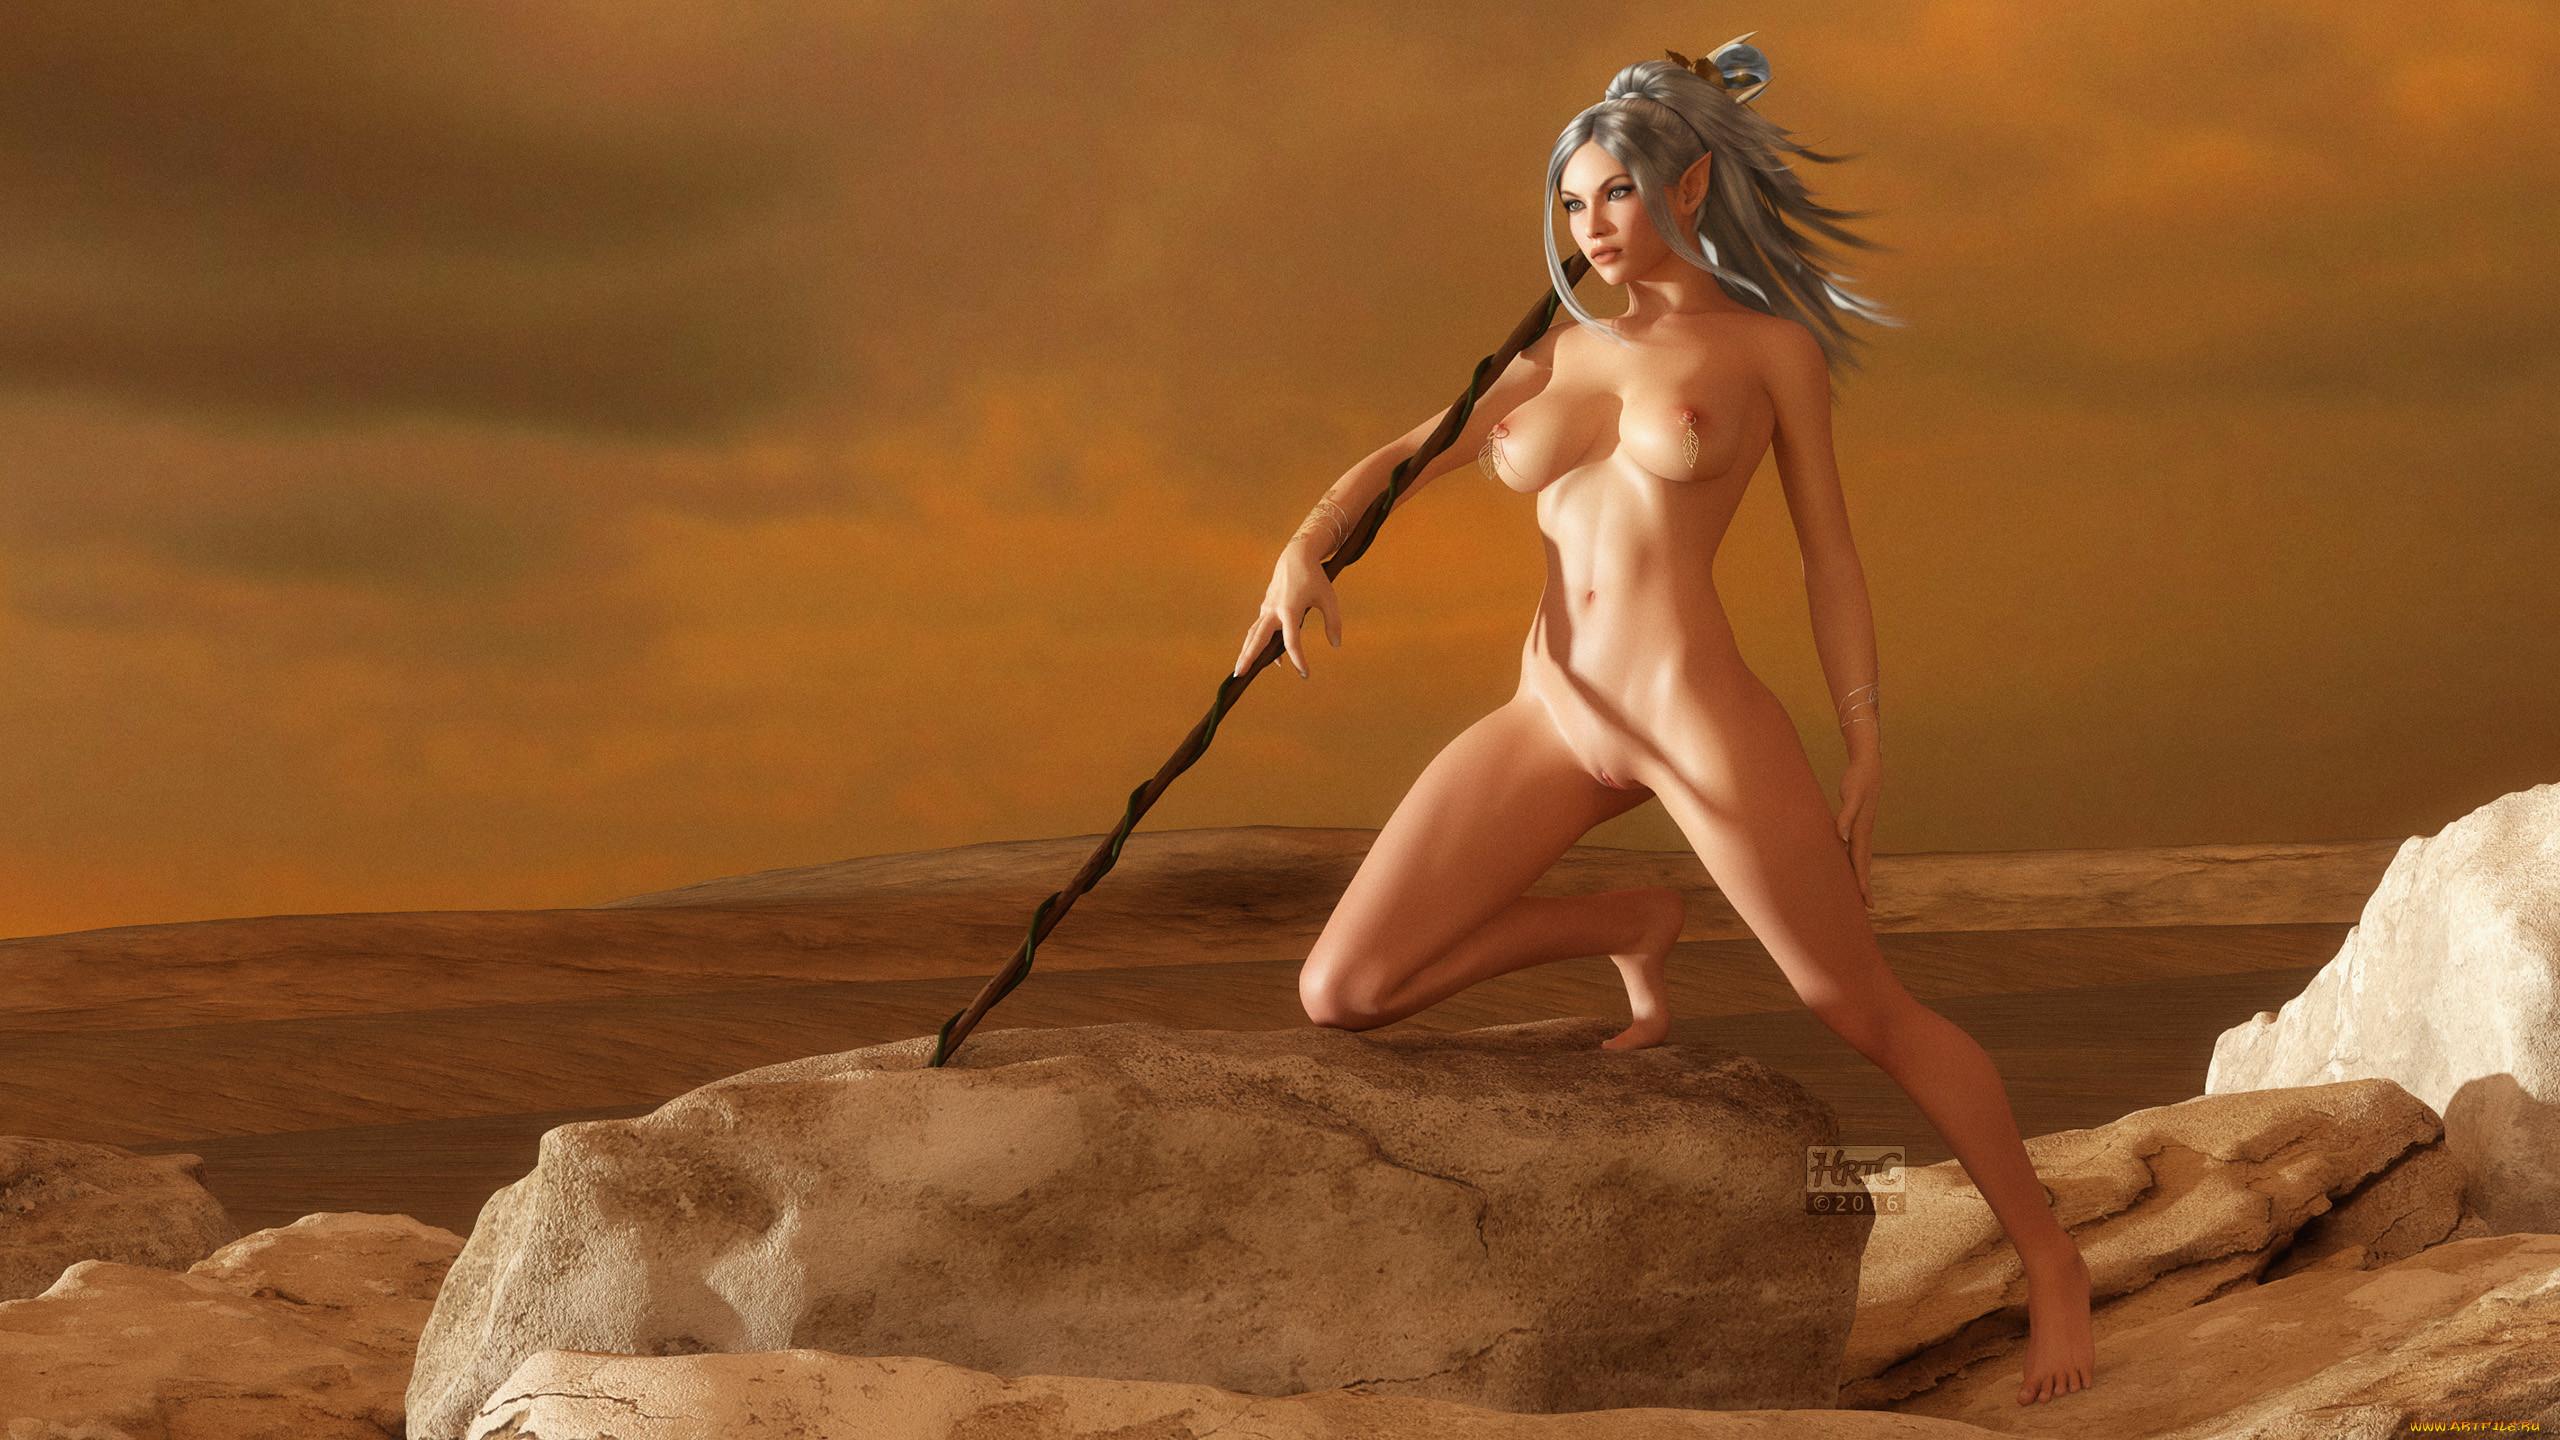 fotos-anal-hd-nude-wallpaper-fantasy-girl-nude-girls